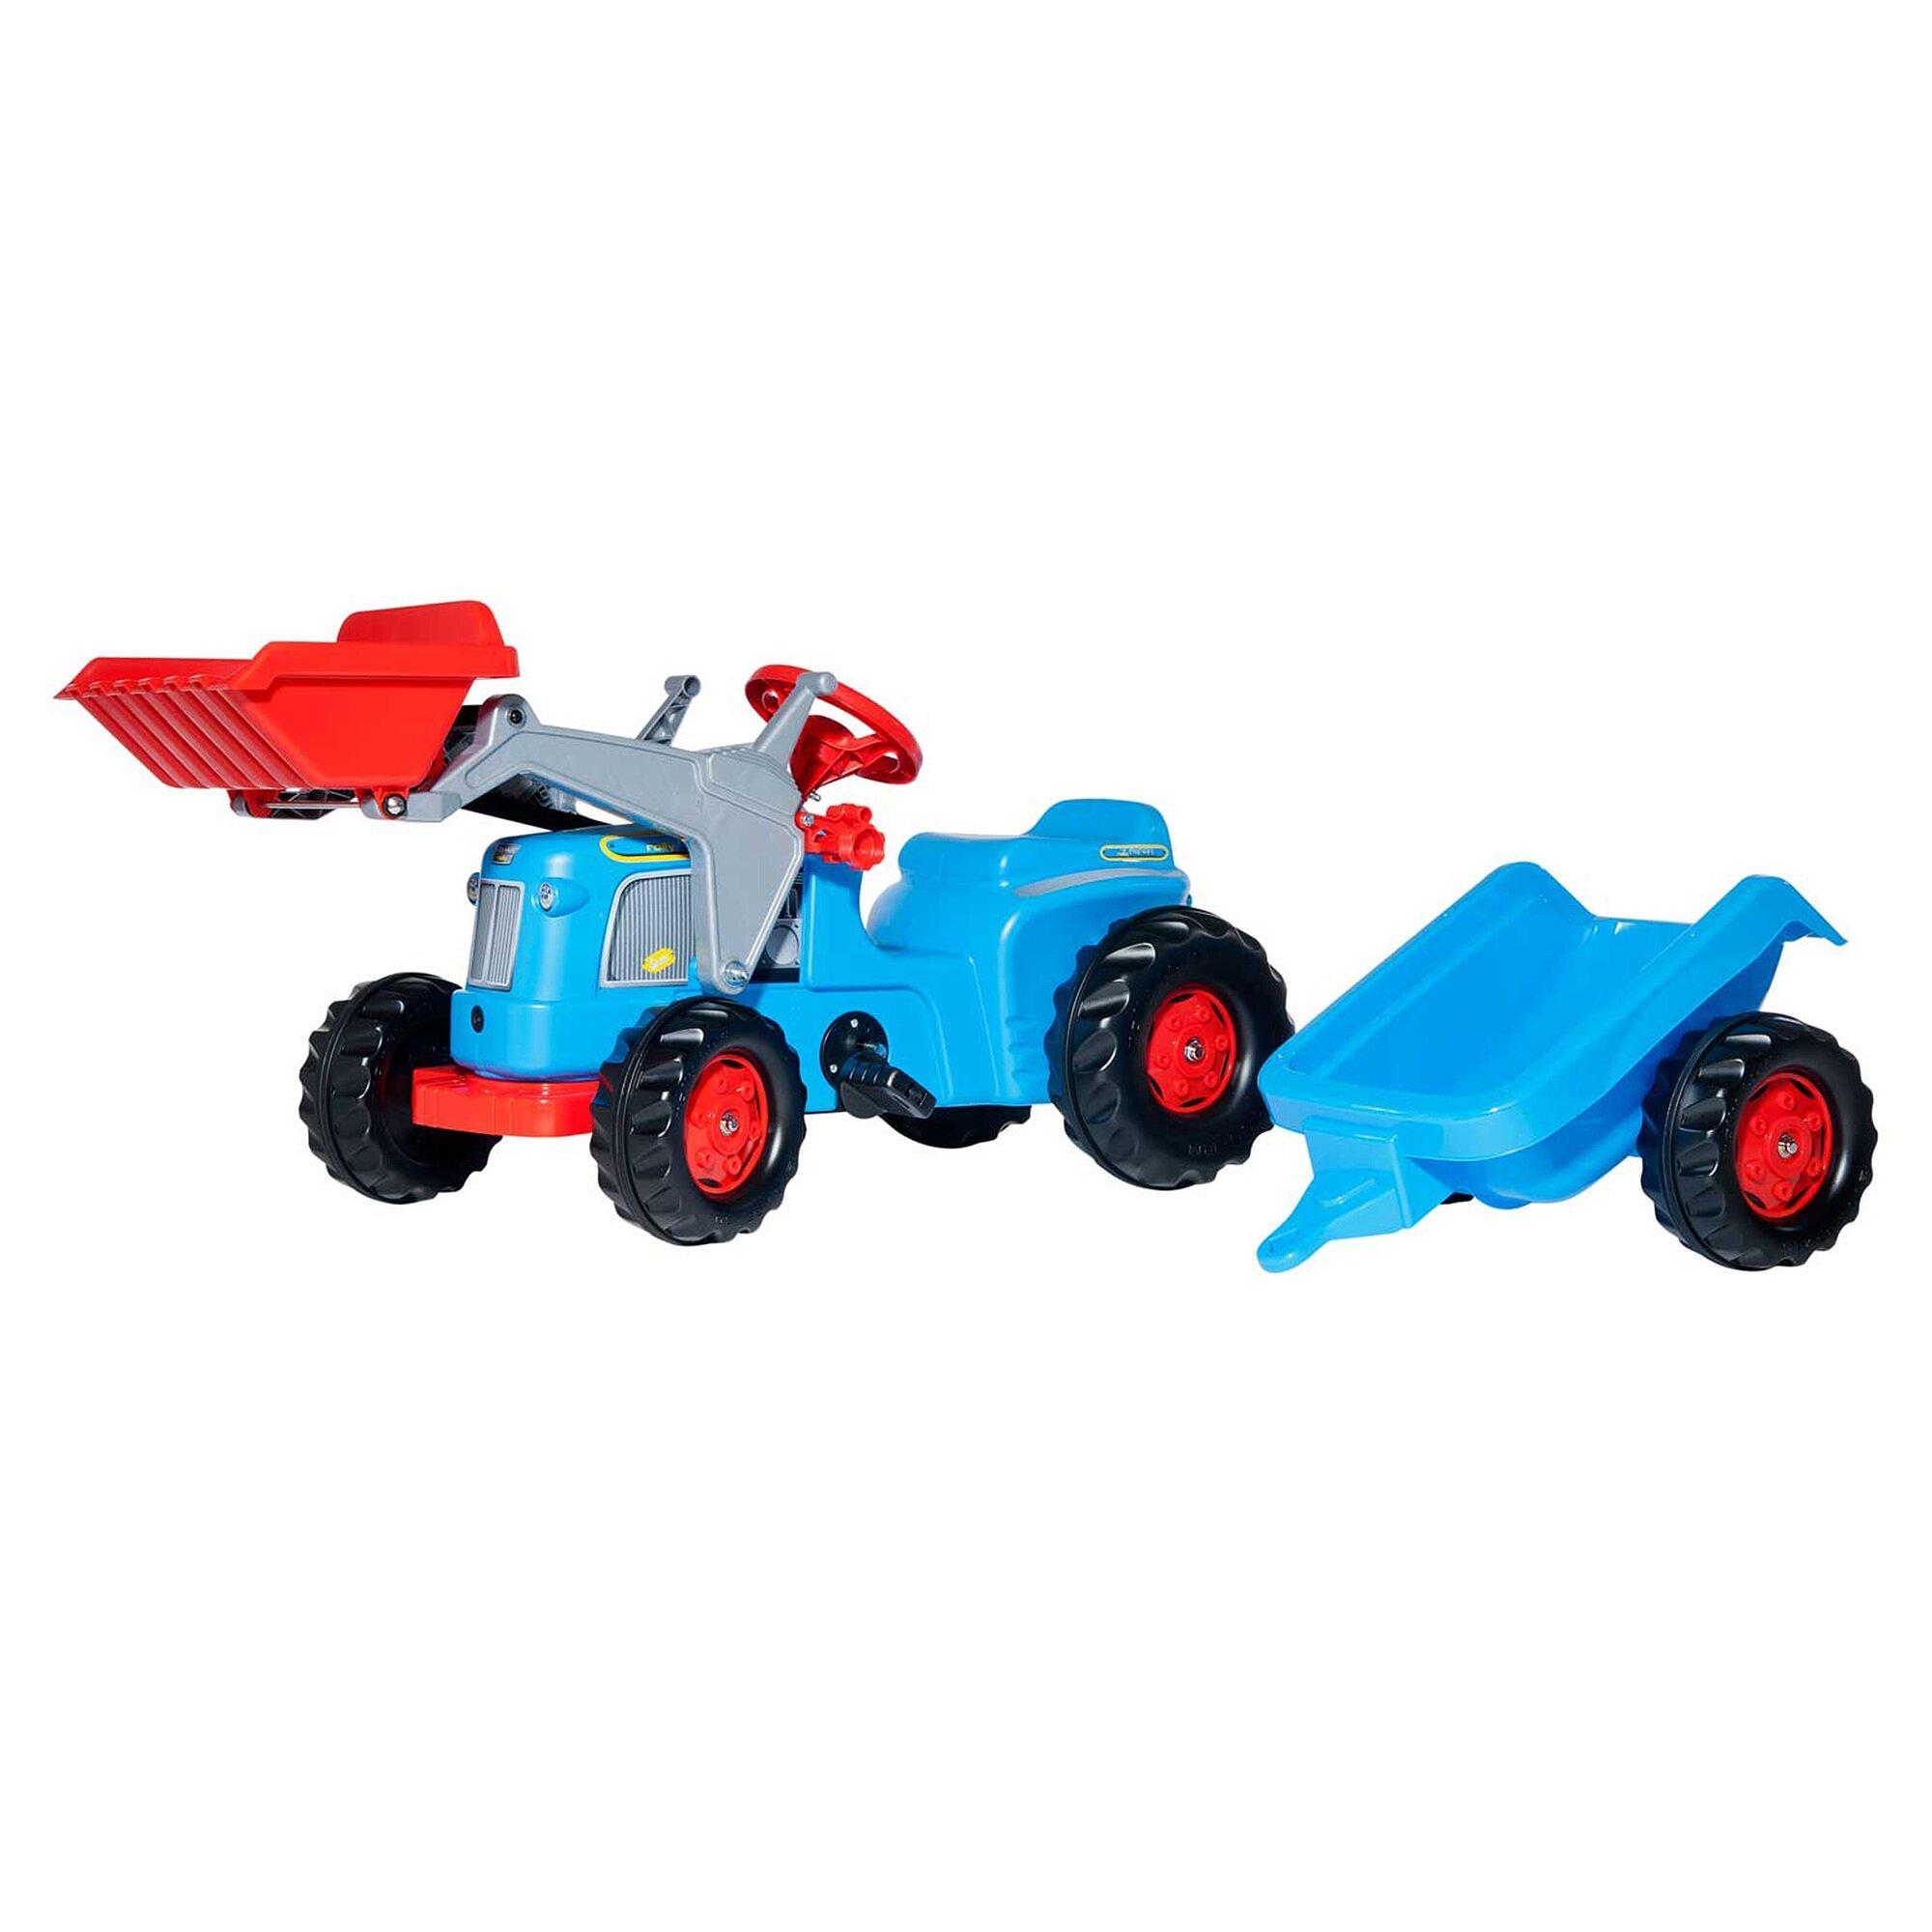 Rolly Toys® Trettraktor Rolly Kiddy Classic mit Frontlader und Anhänger